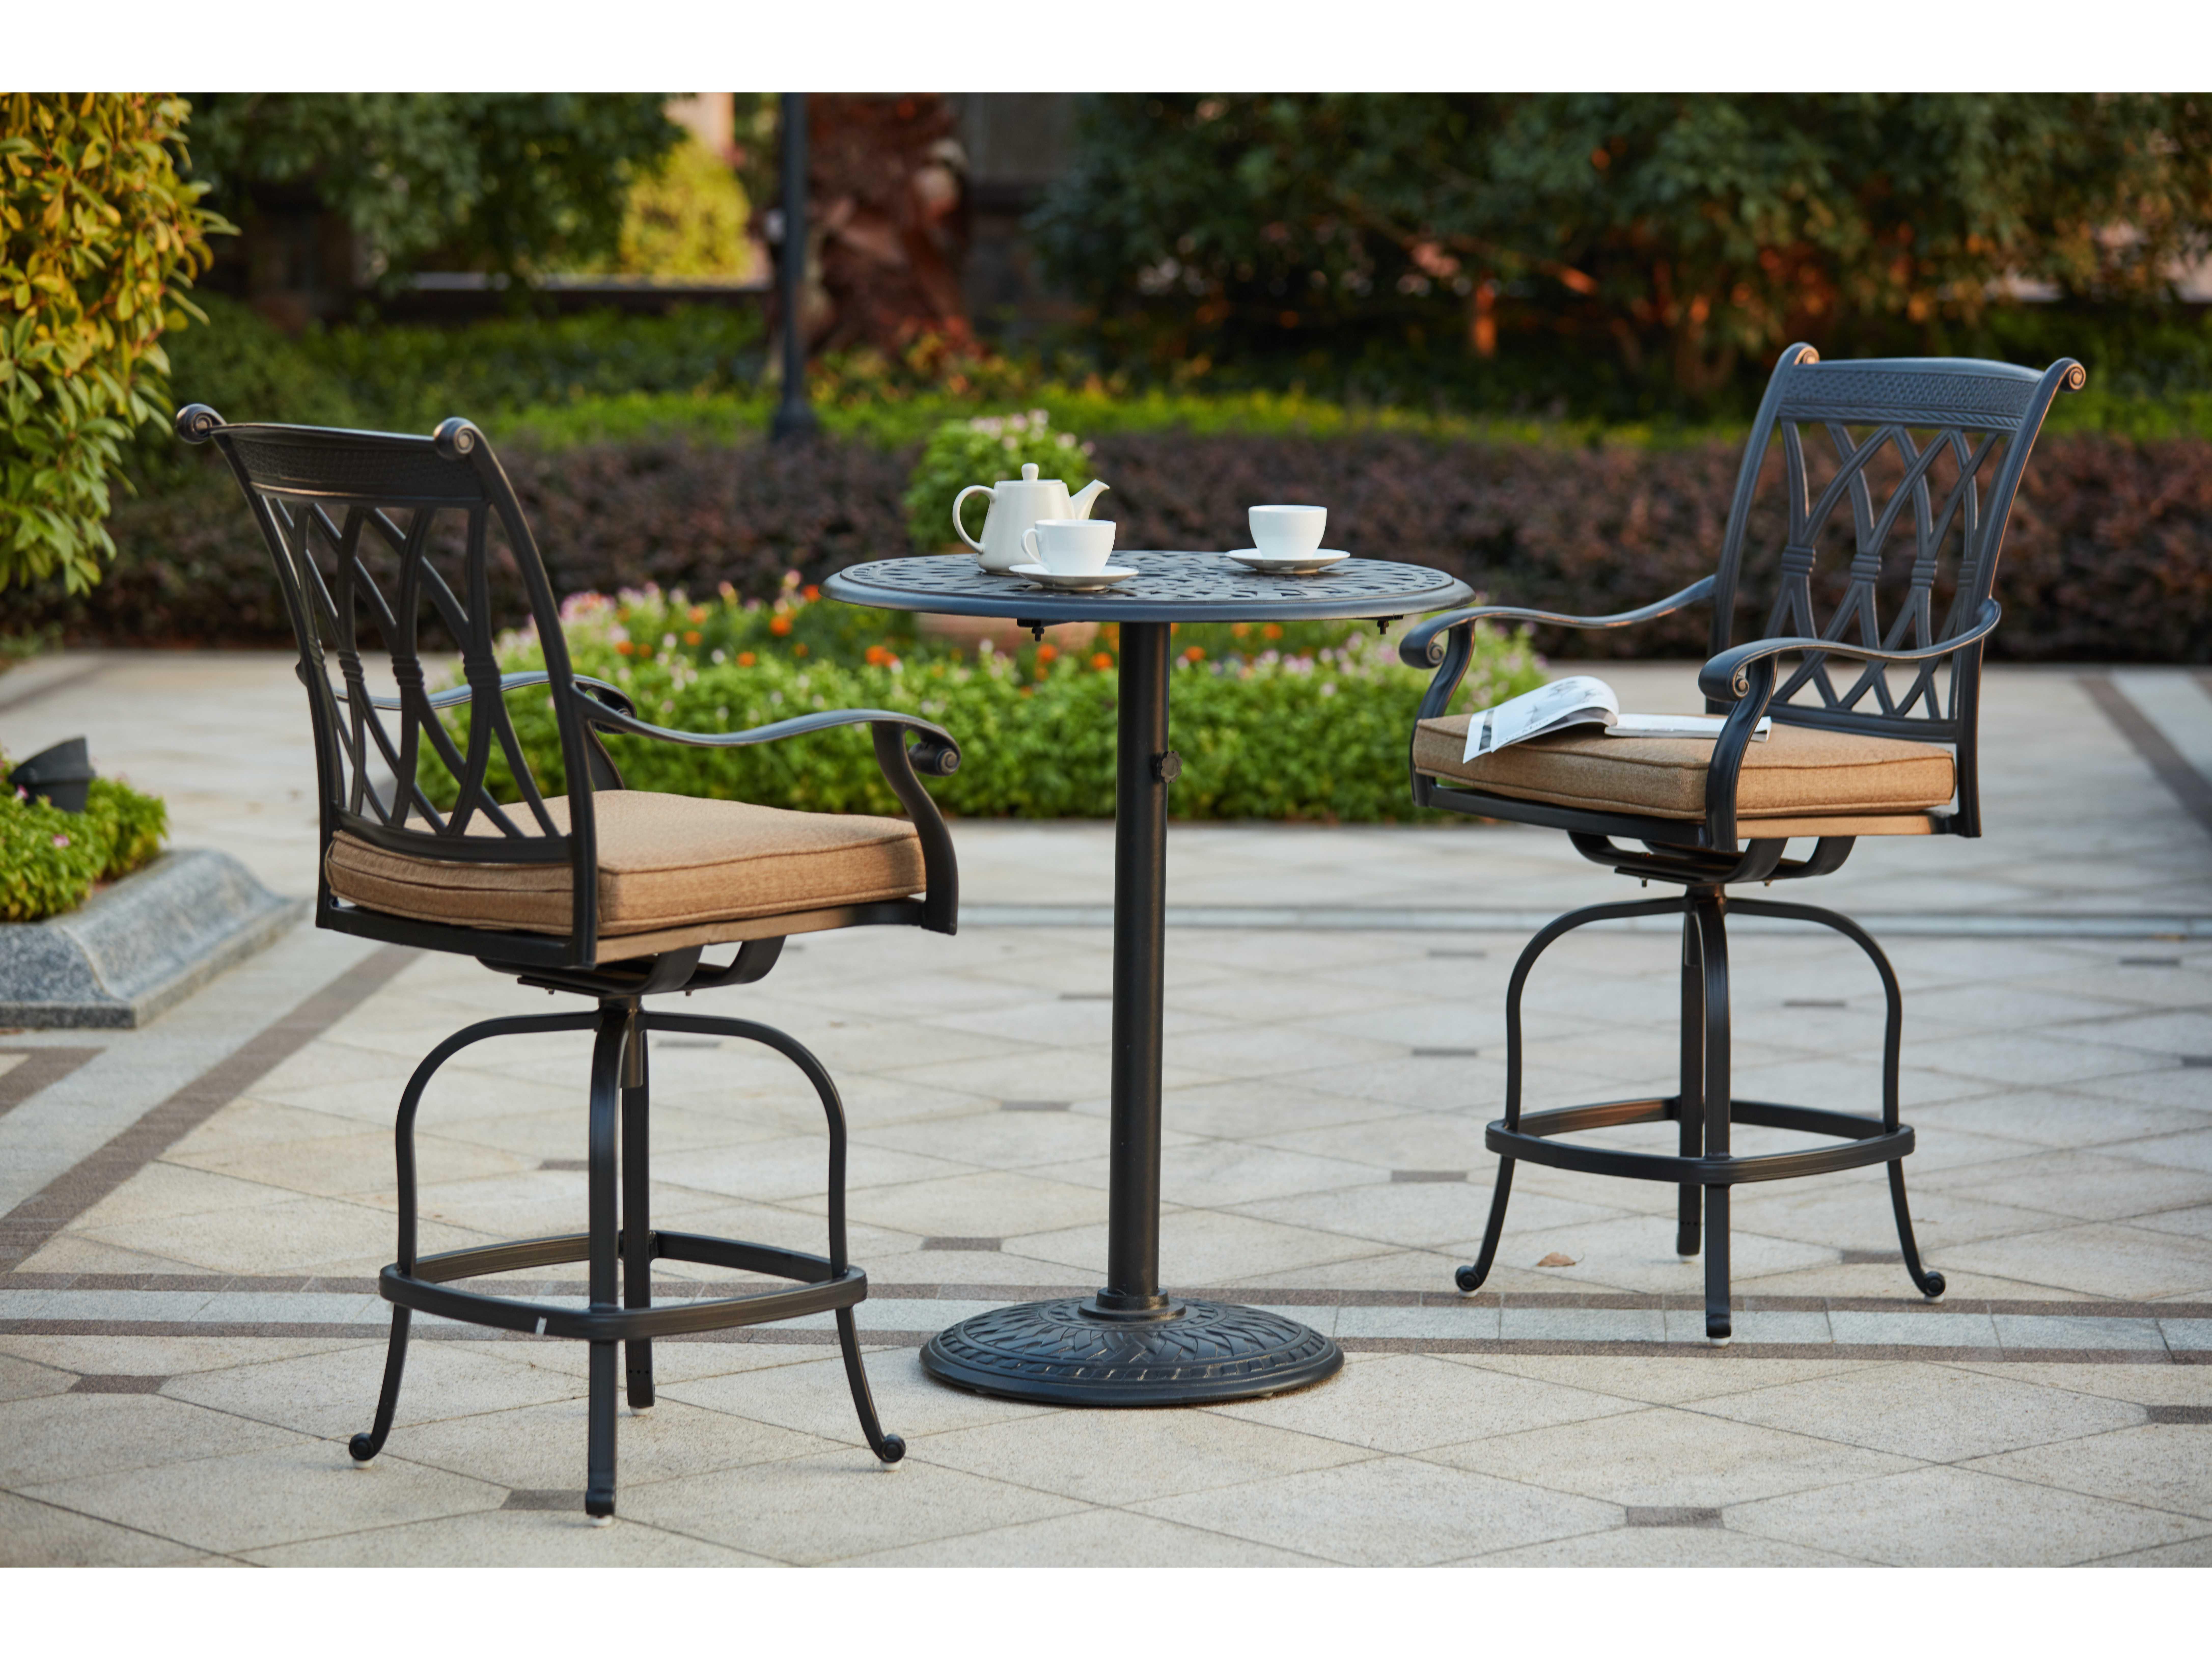 Darlee Outdoor Living Standard Capri Cast Aluminum 3 Piece